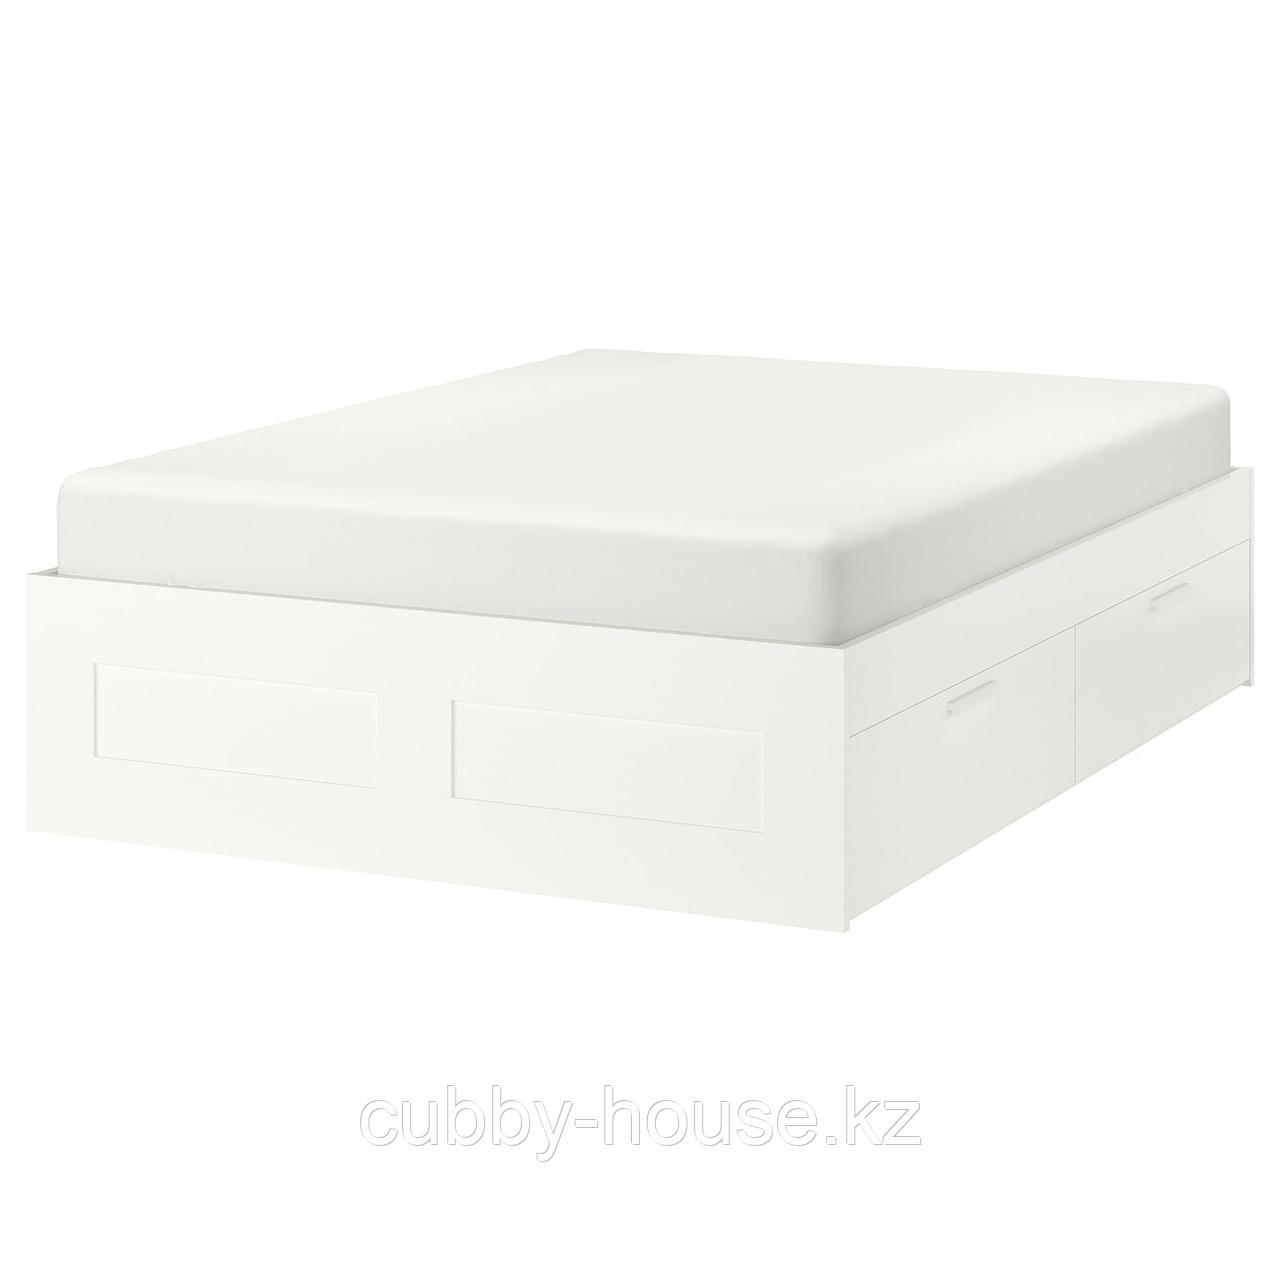 БРИМНЭС Каркас кровати с ящиками, белый, Лурой, 160x200 см